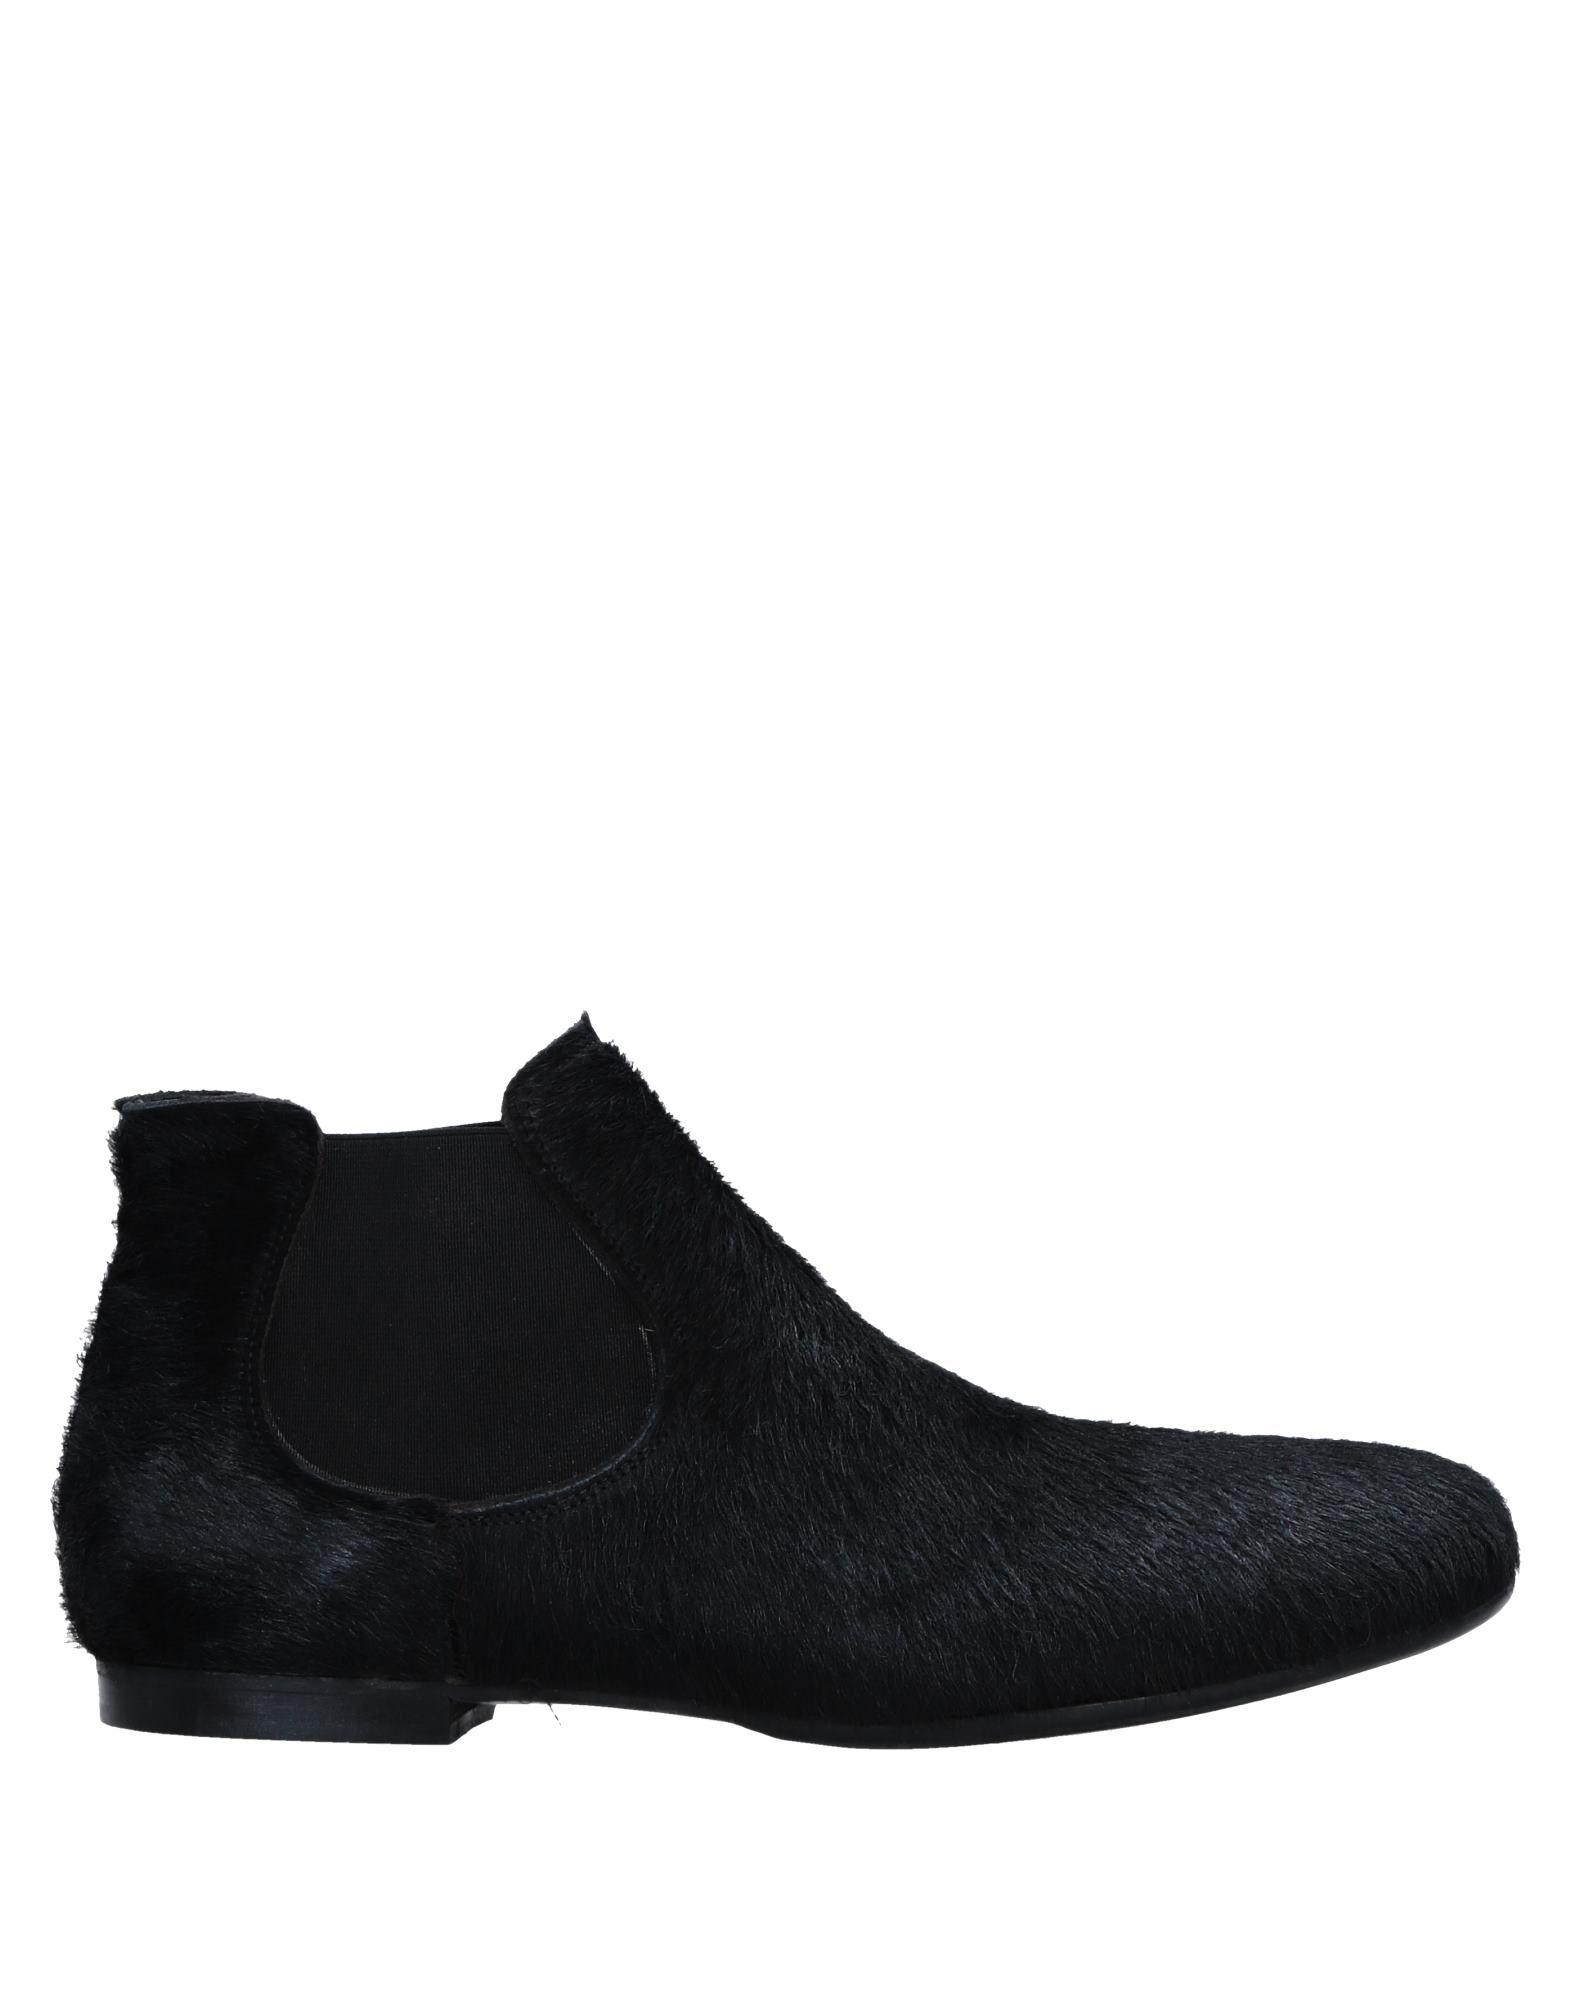 Diva Shoes Chelsea Boots Damen  11526075PTGut aussehende strapazierfähige Schuhe